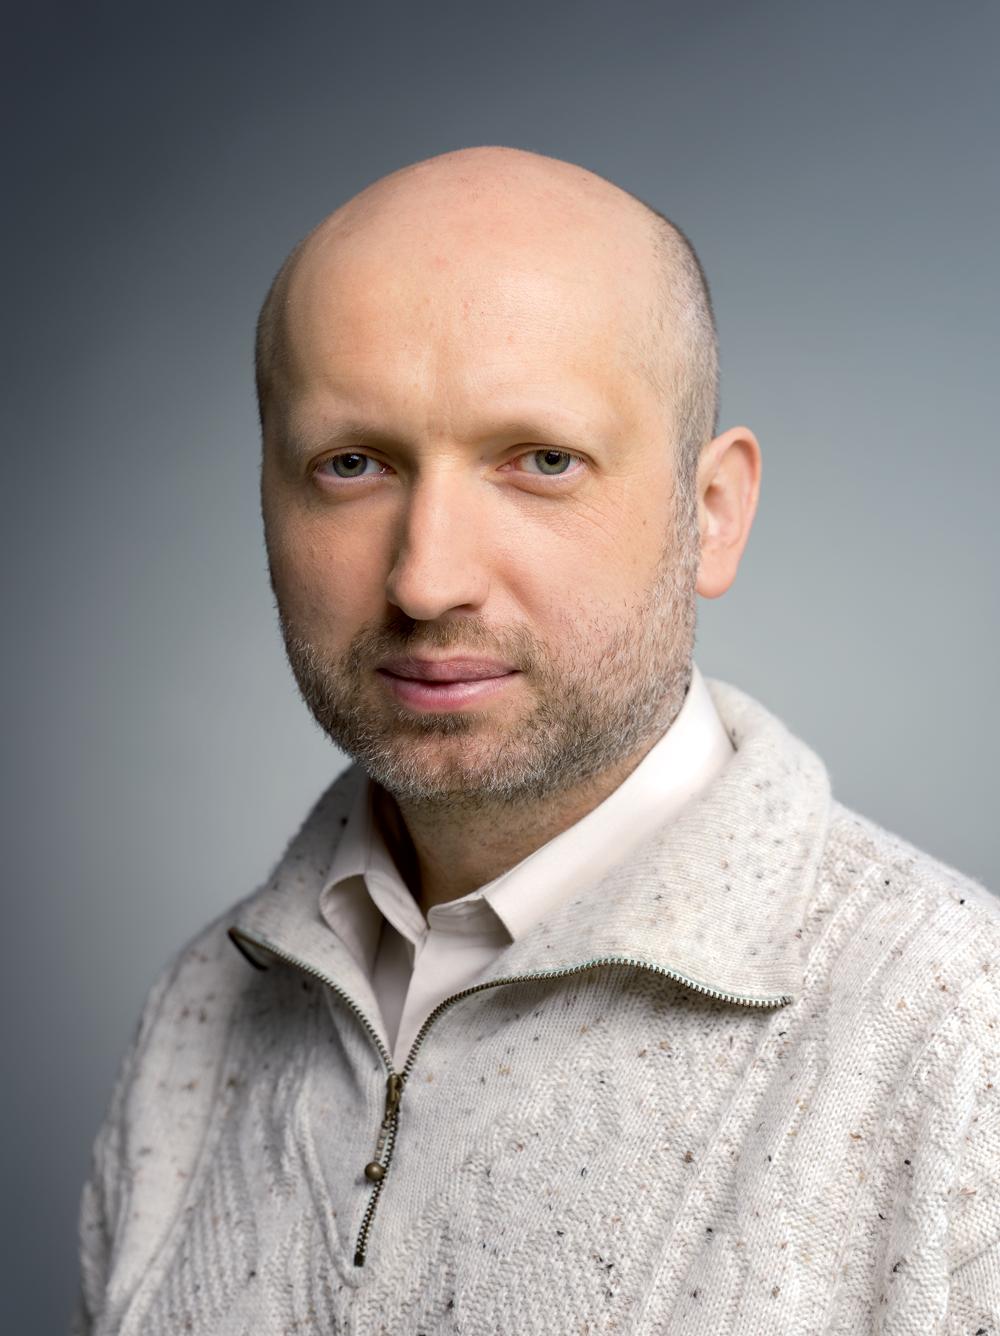 Александр Турчинов ченнинг татум рост